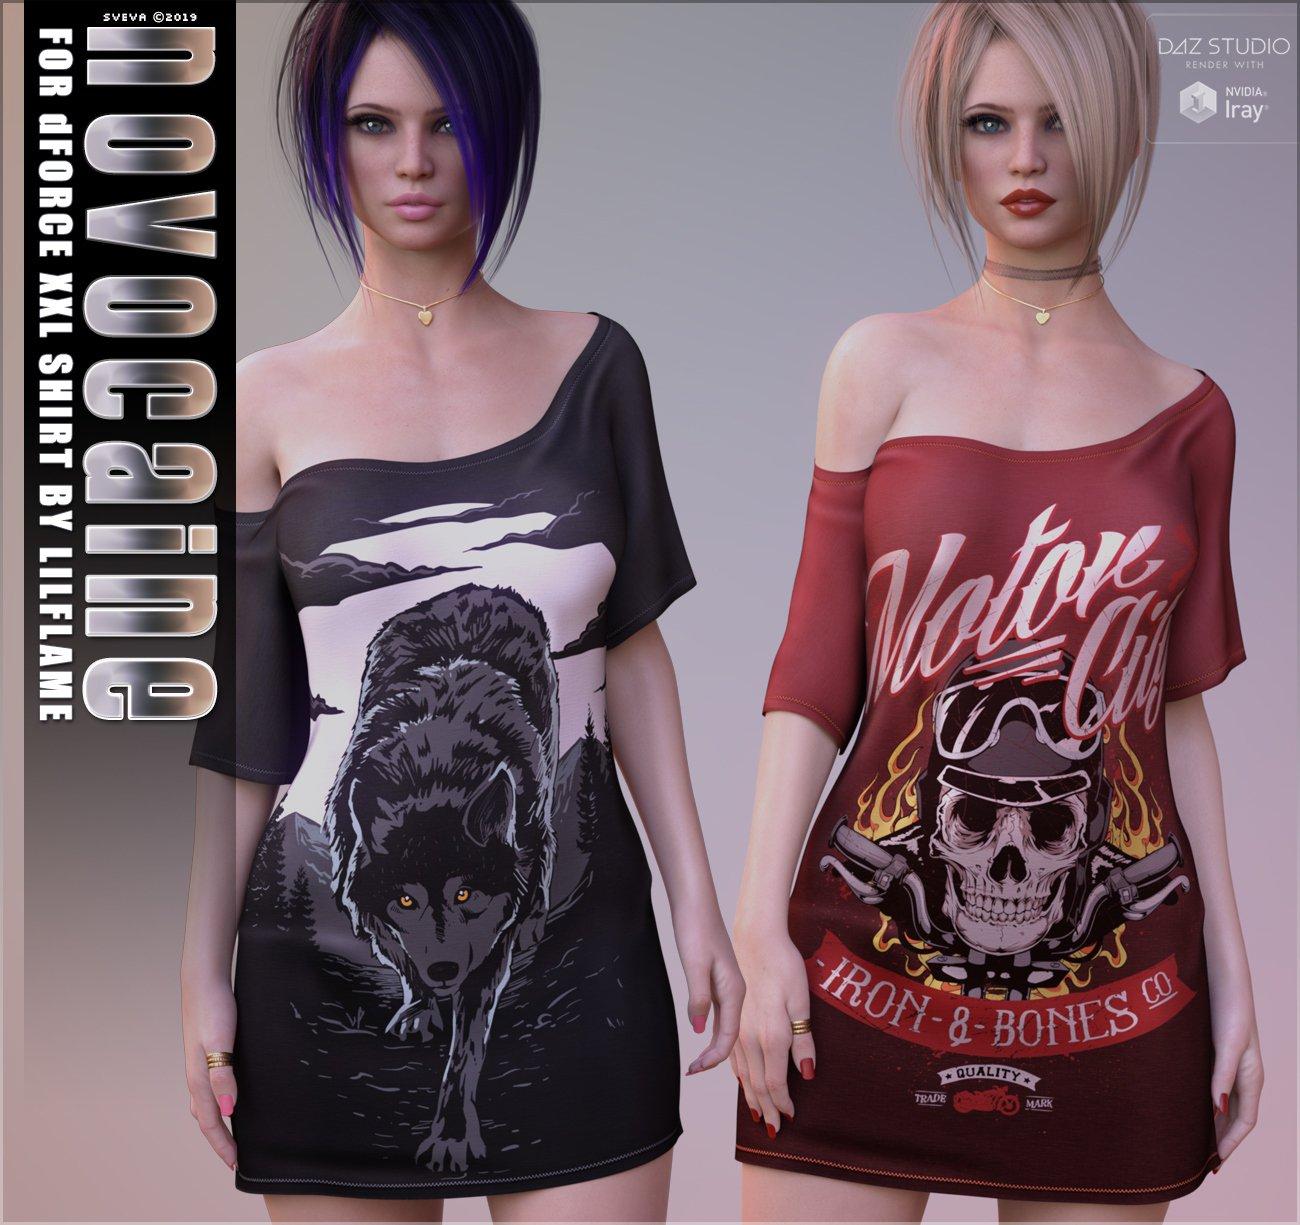 Novocaine for dForce XXL Shirt_DAZ3D下载站